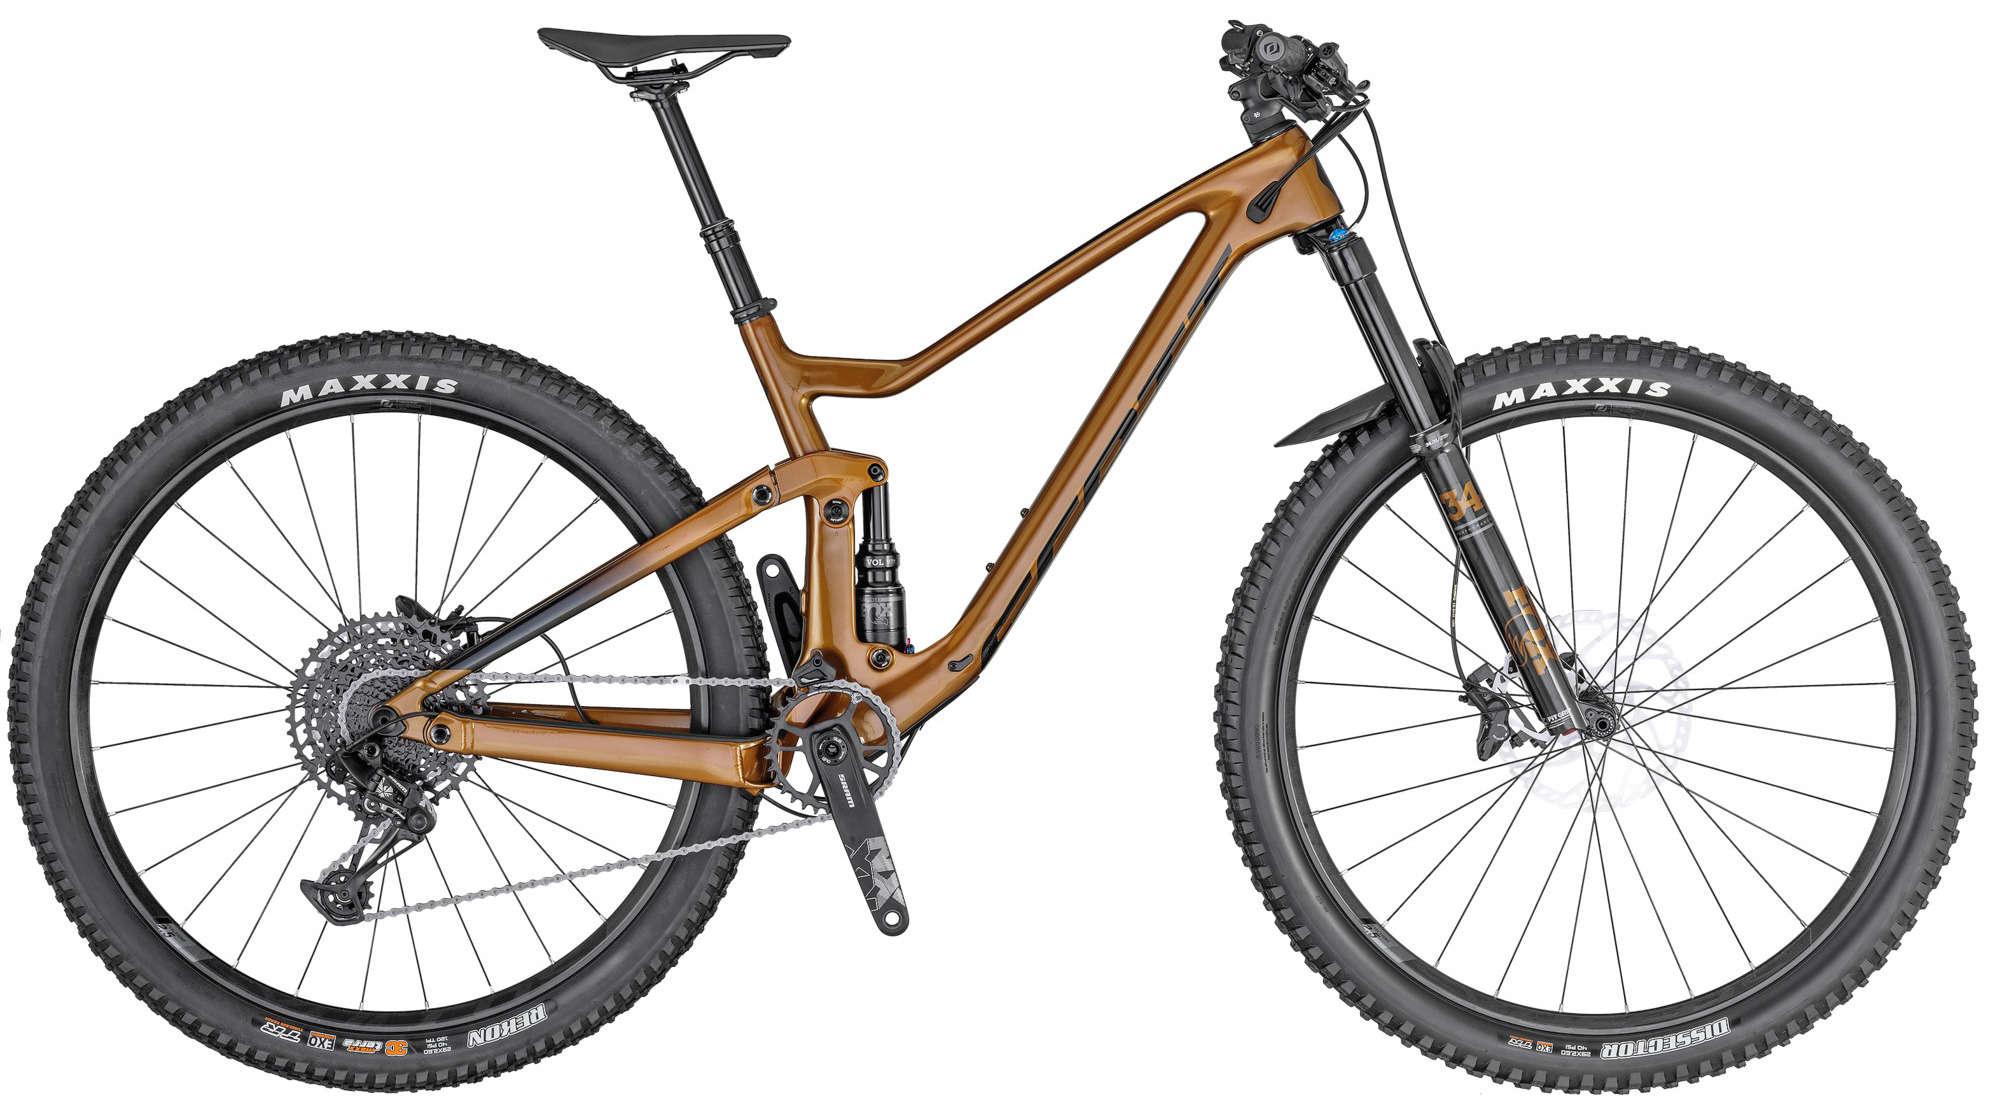 rental bike image